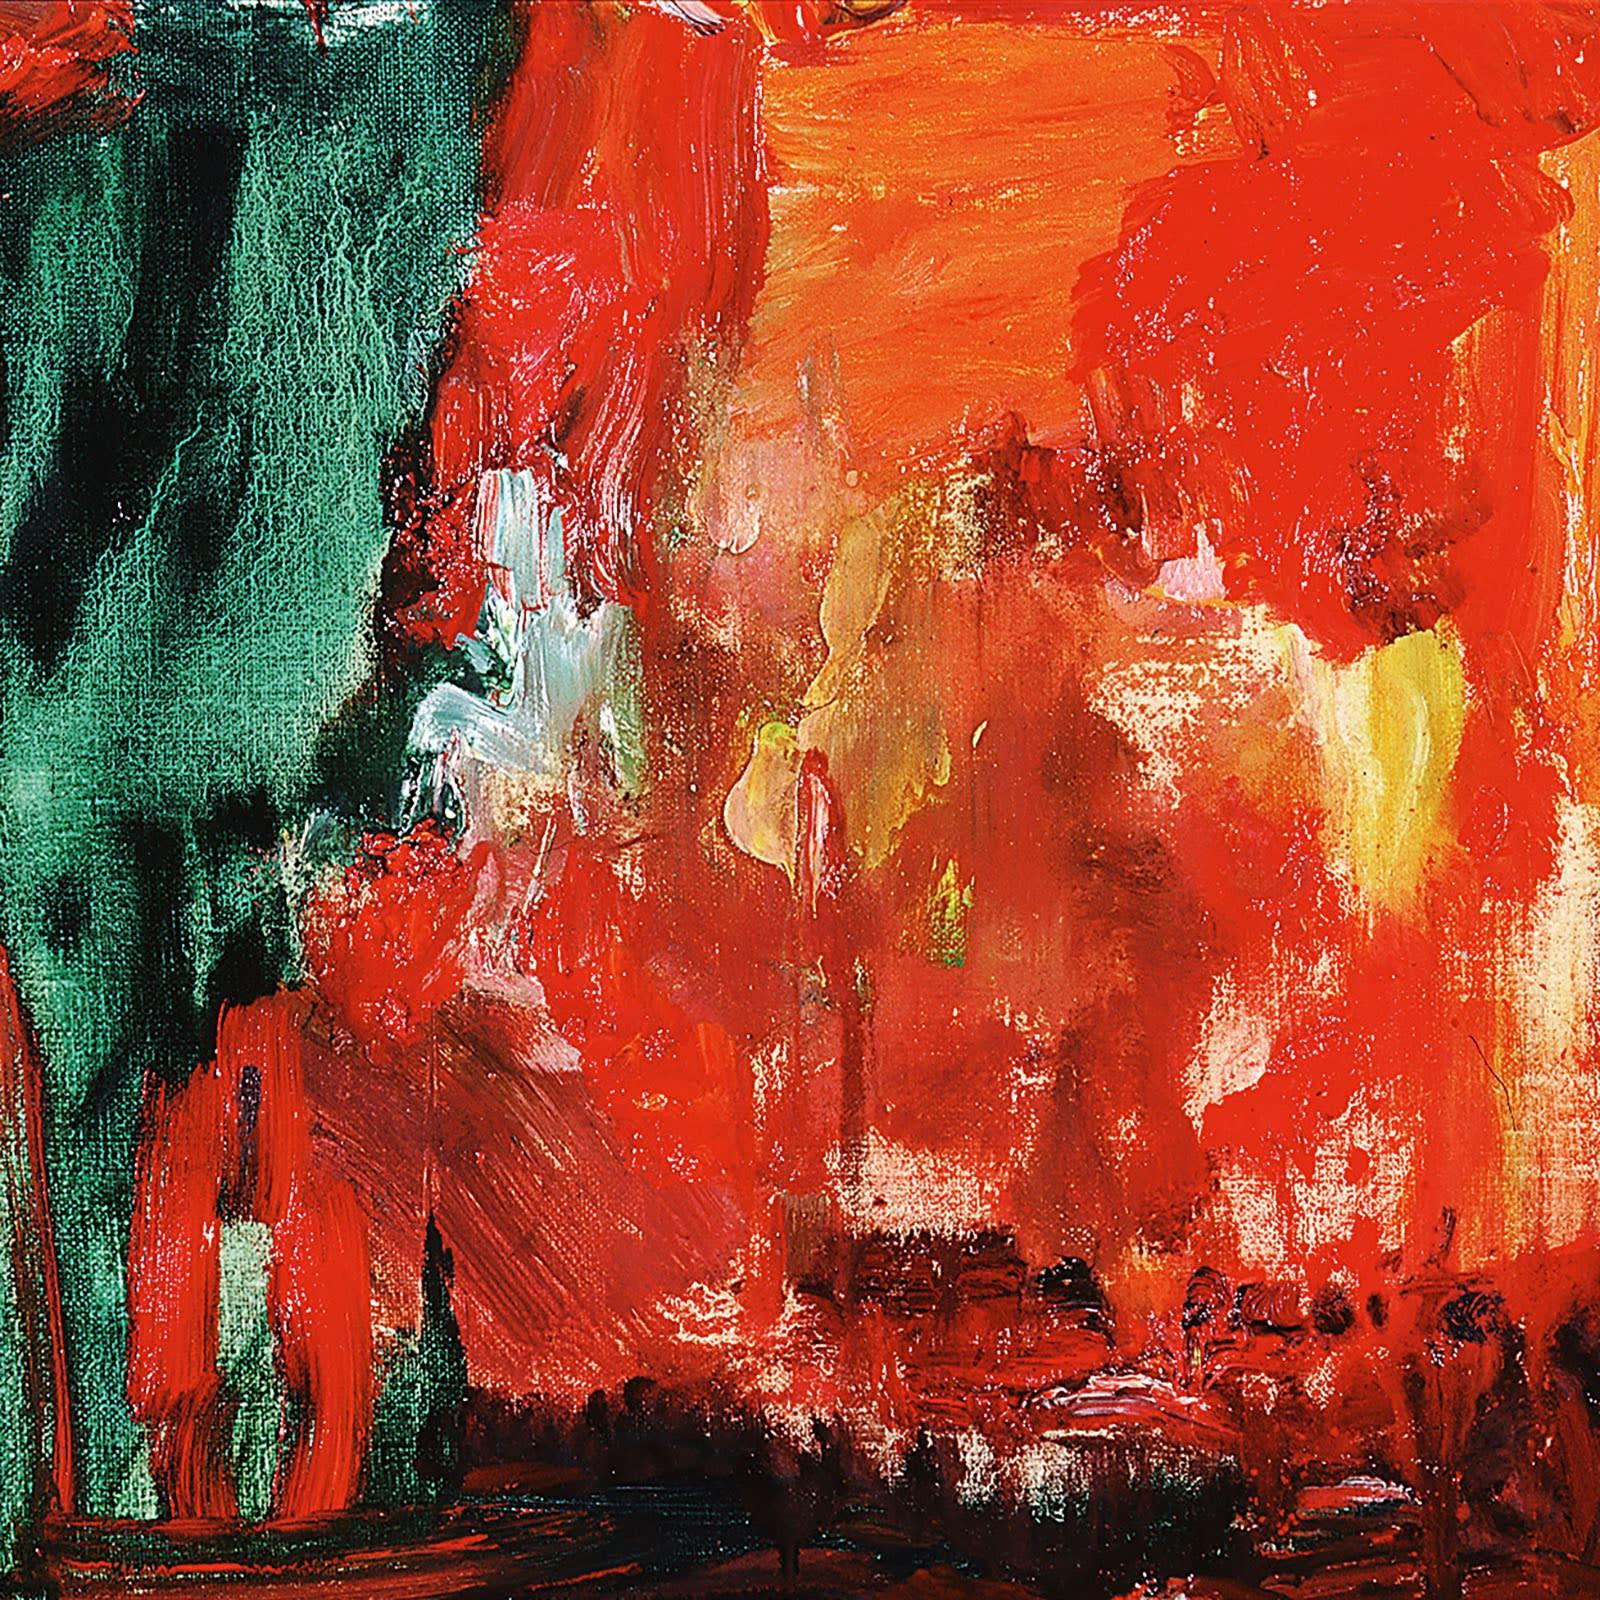 THE LIGHTS BURNED DEEP INTO THE NIGHT, 1998